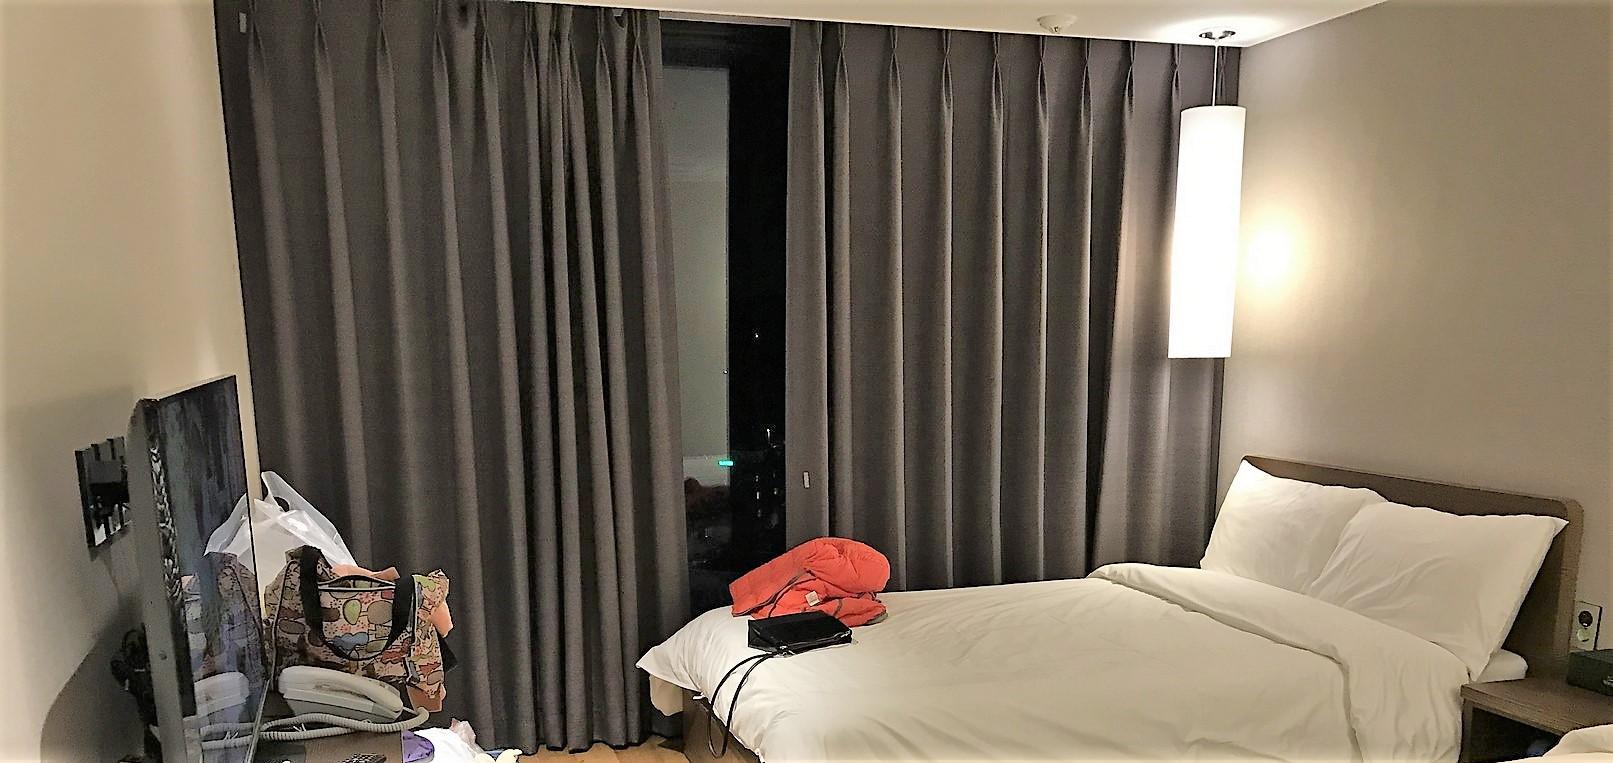 Review ofVistacay Hotel inSeogwipo Jeju